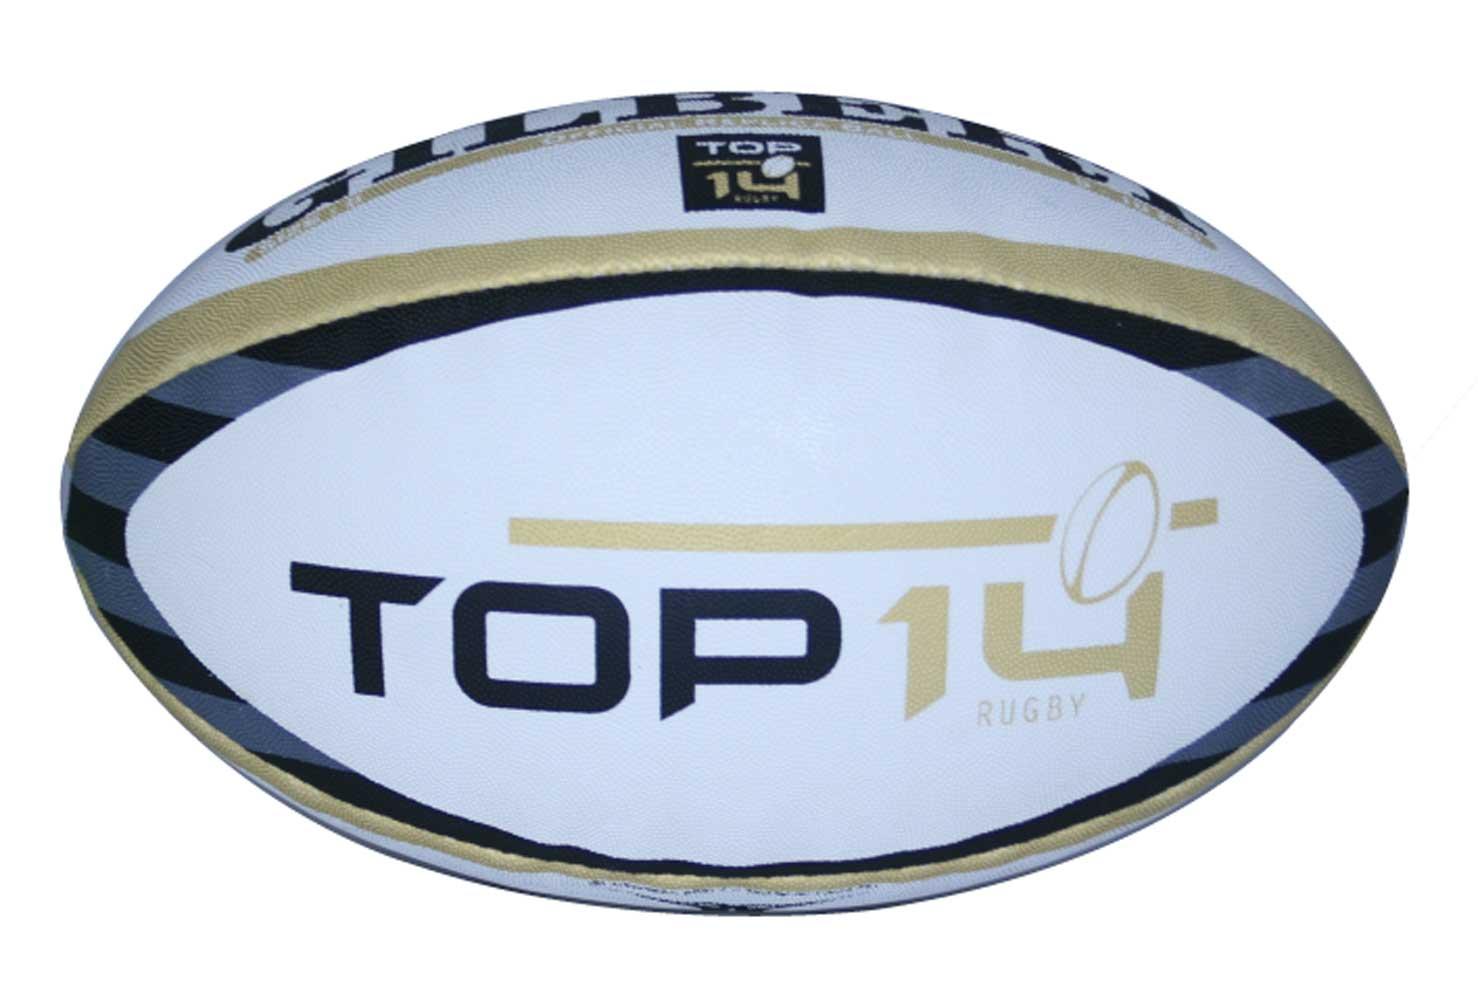 a85c18669e095 Ballon rugby réplica Top 14 - T5 - Gilbert at shop Rugby-Corner.com